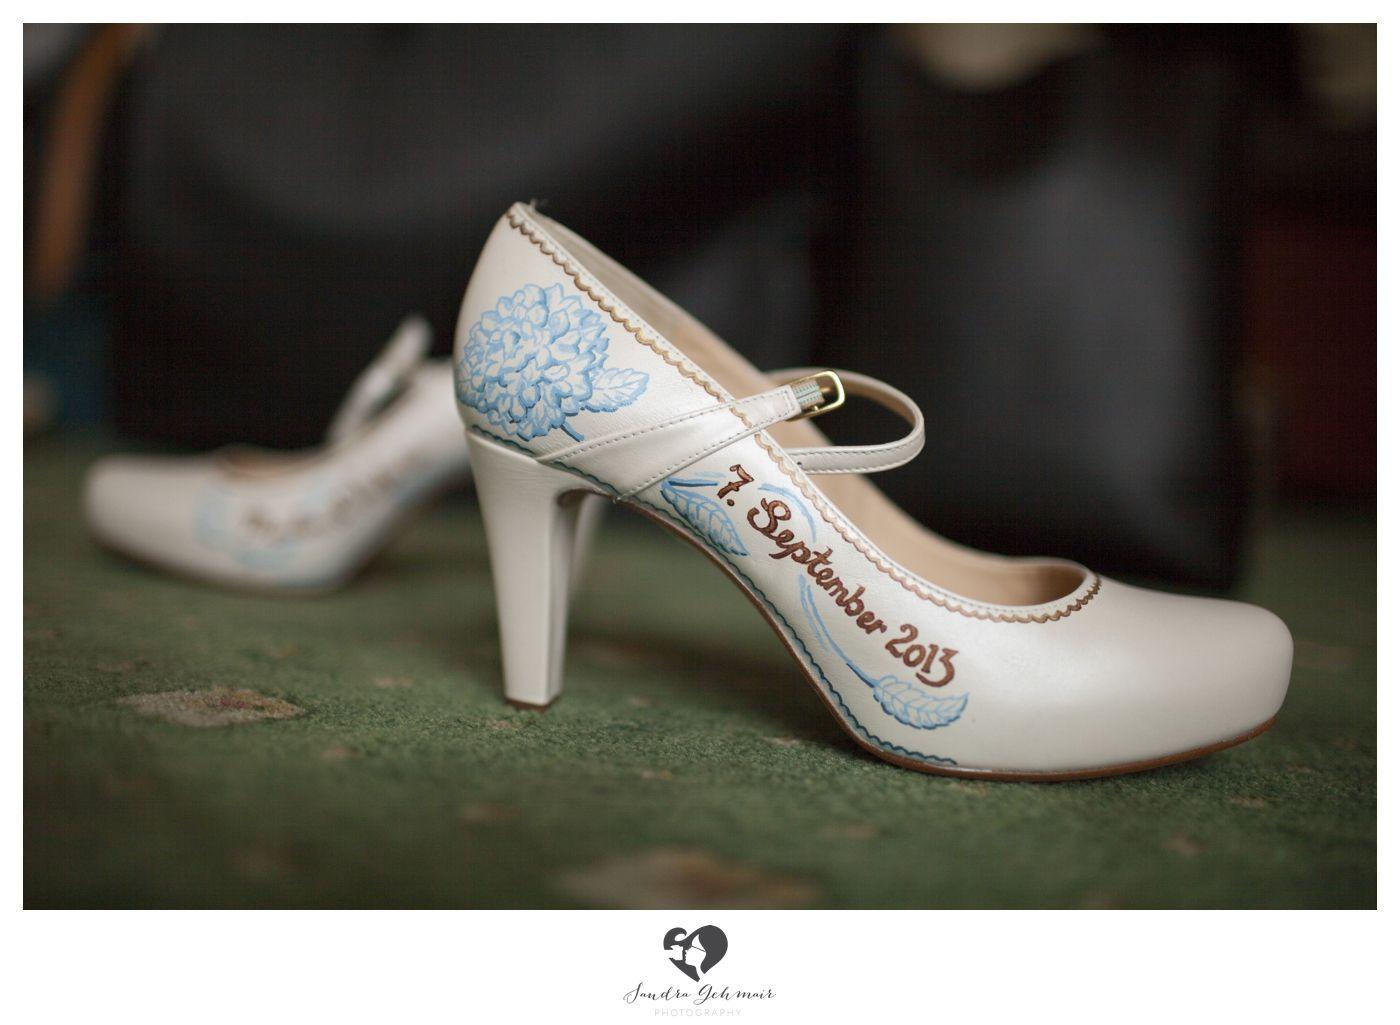 sports shoes 6dc8e 6493d Schuhe #Brautschuhe #footwear #bridal #bride #braut ...